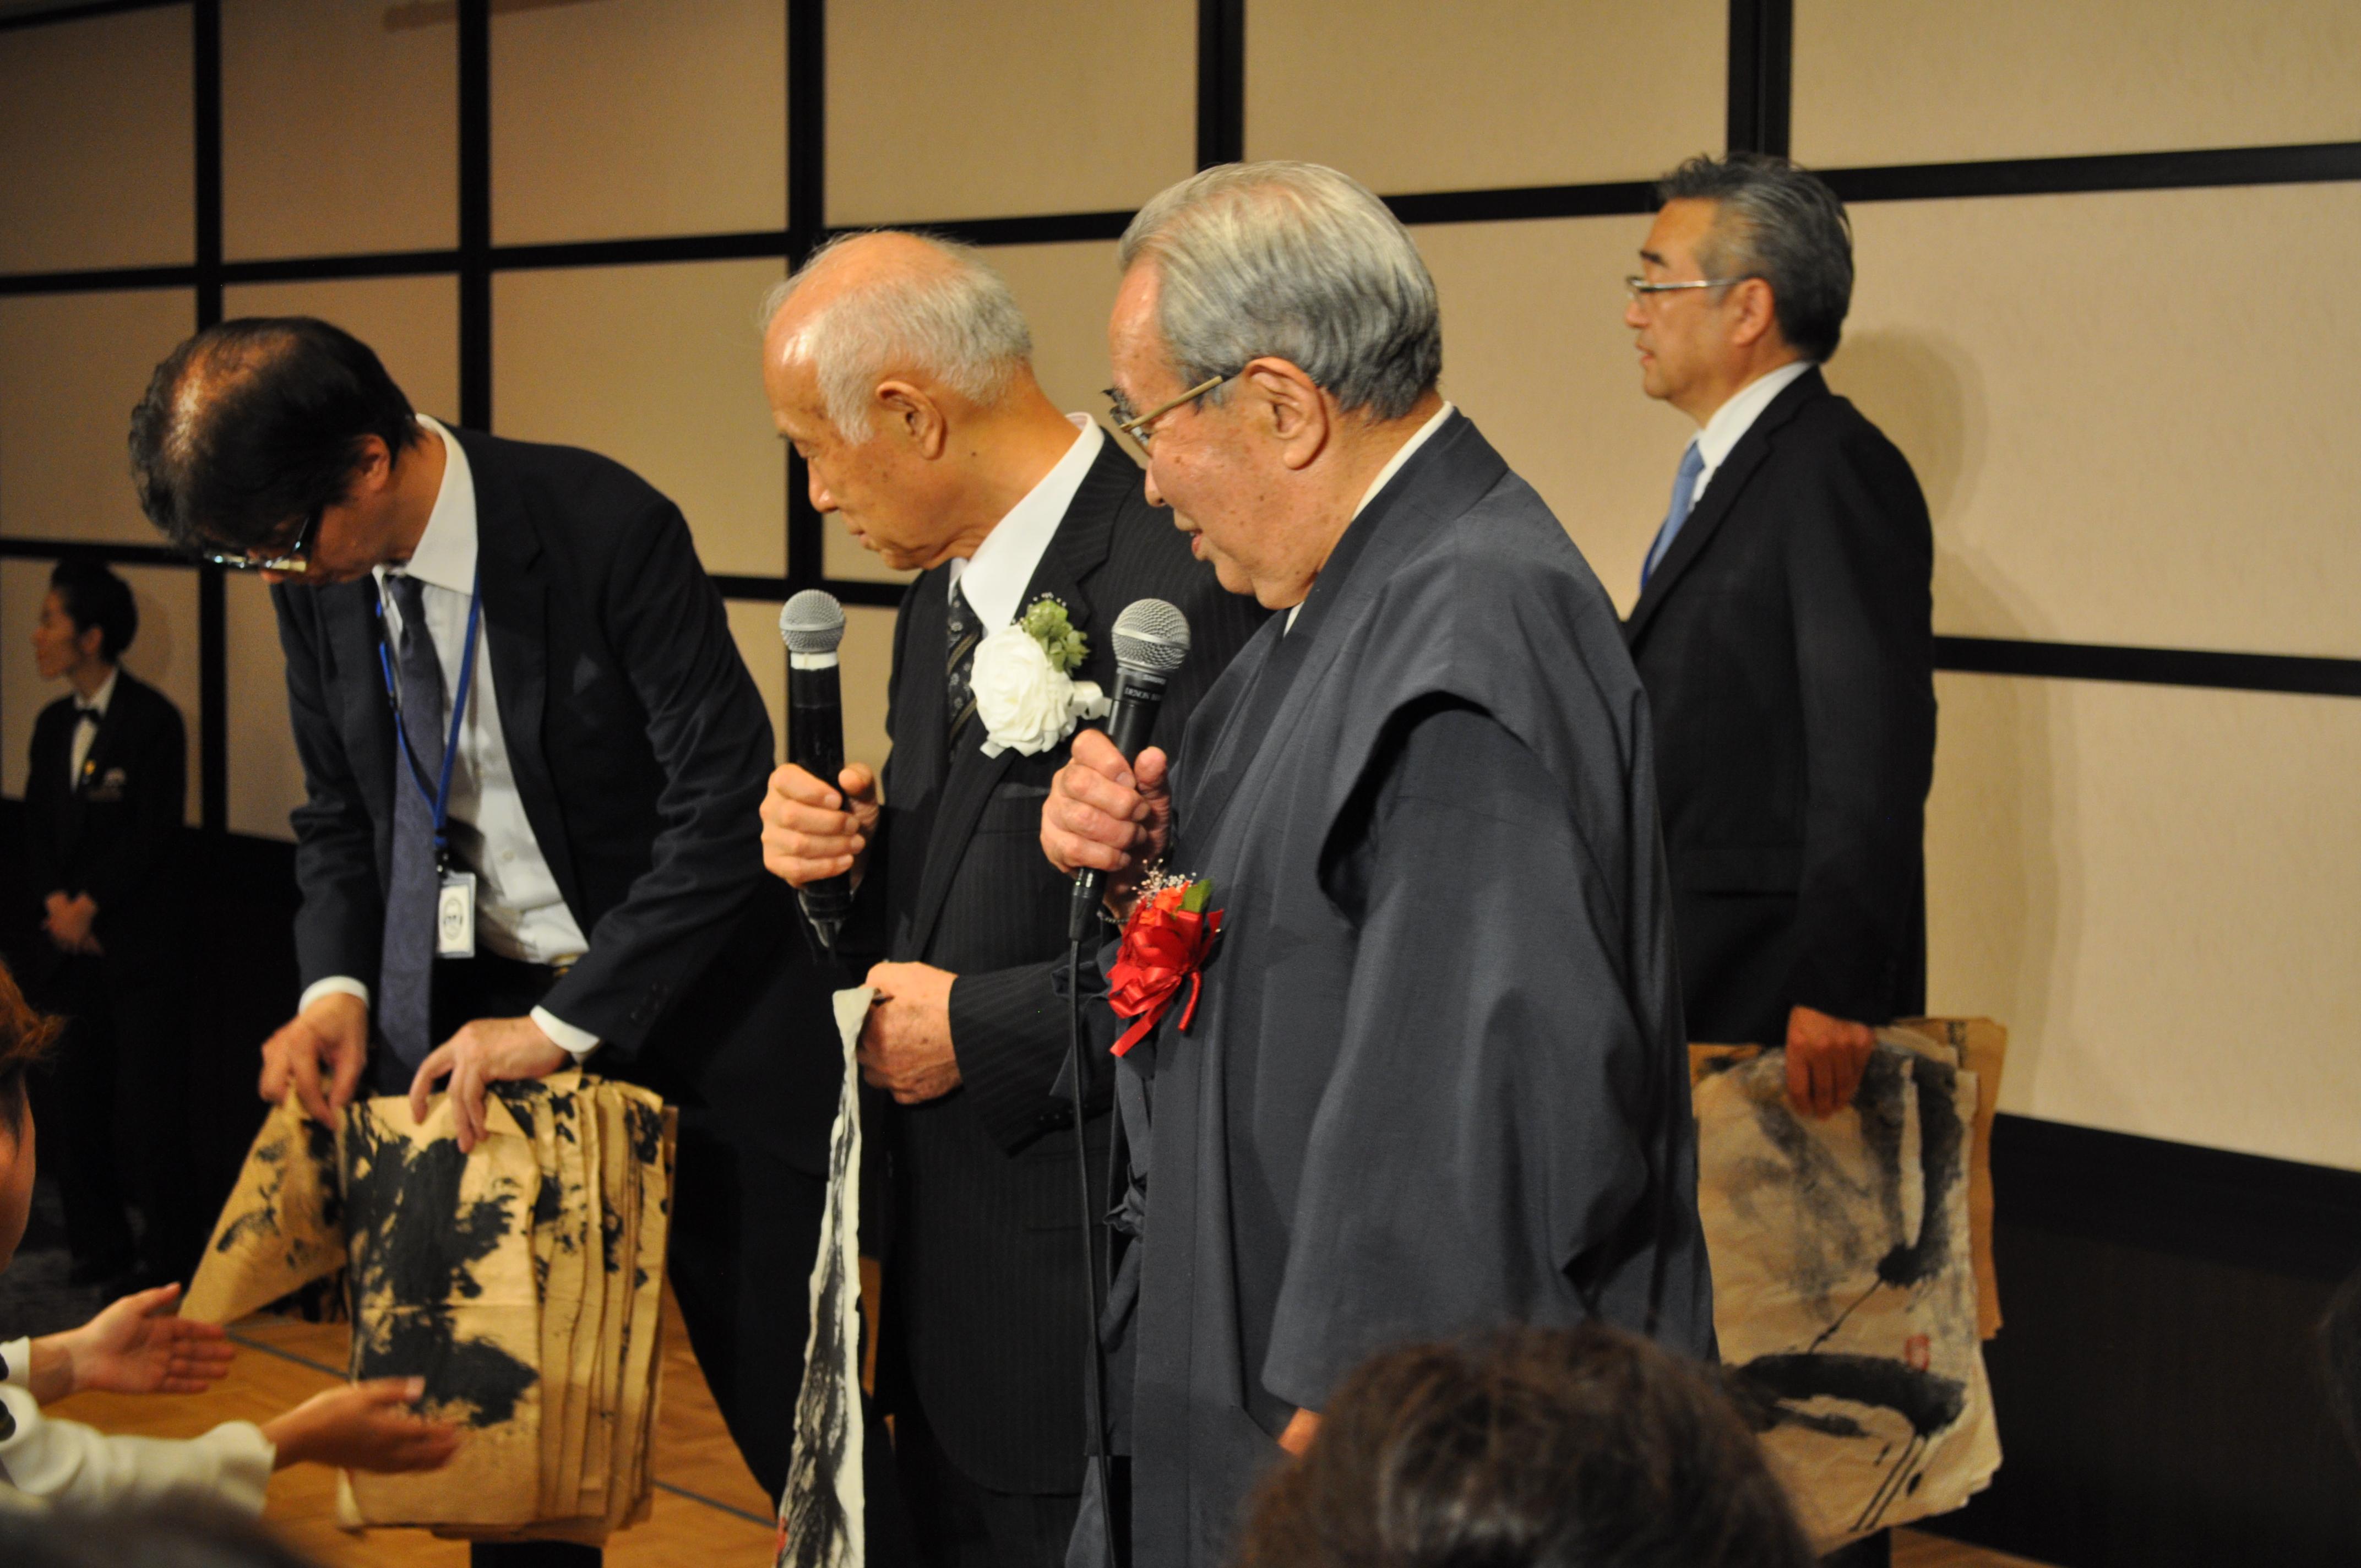 DSC 0599 - 第6回思風会全国大会2018in東京開催